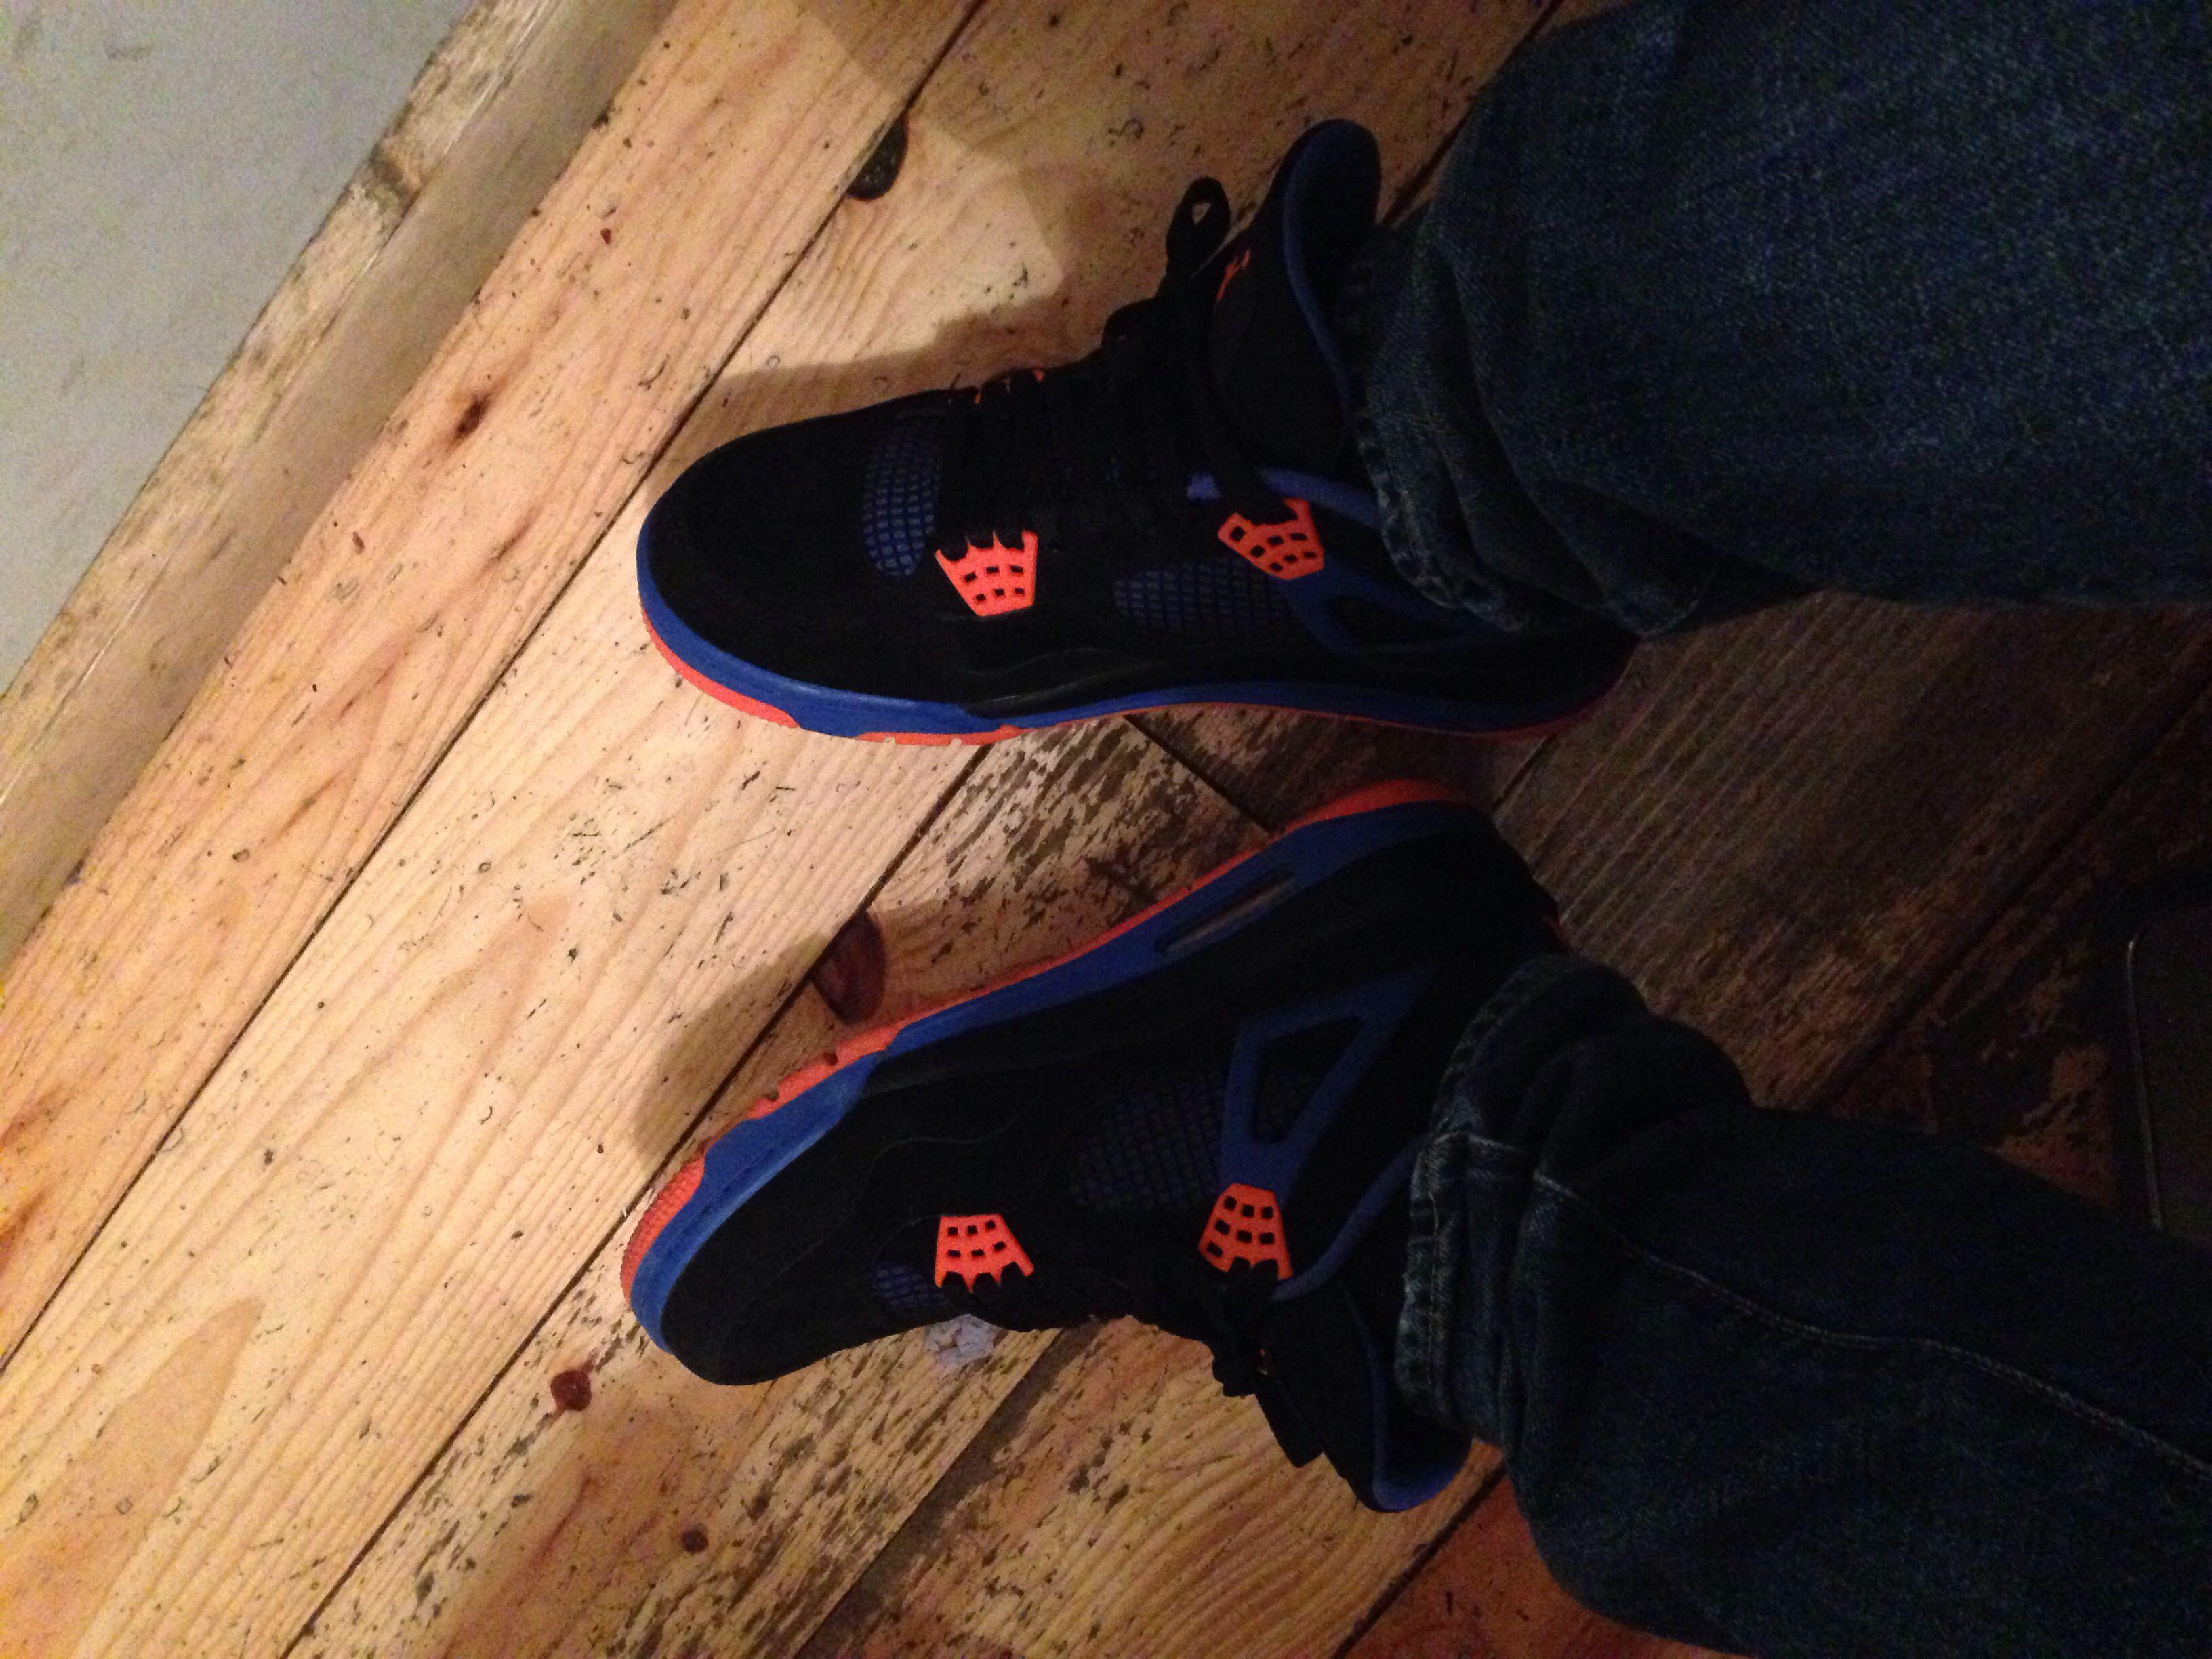 Today's #kicks #sskix #nike #nikeair #Jordan4 #Cavs